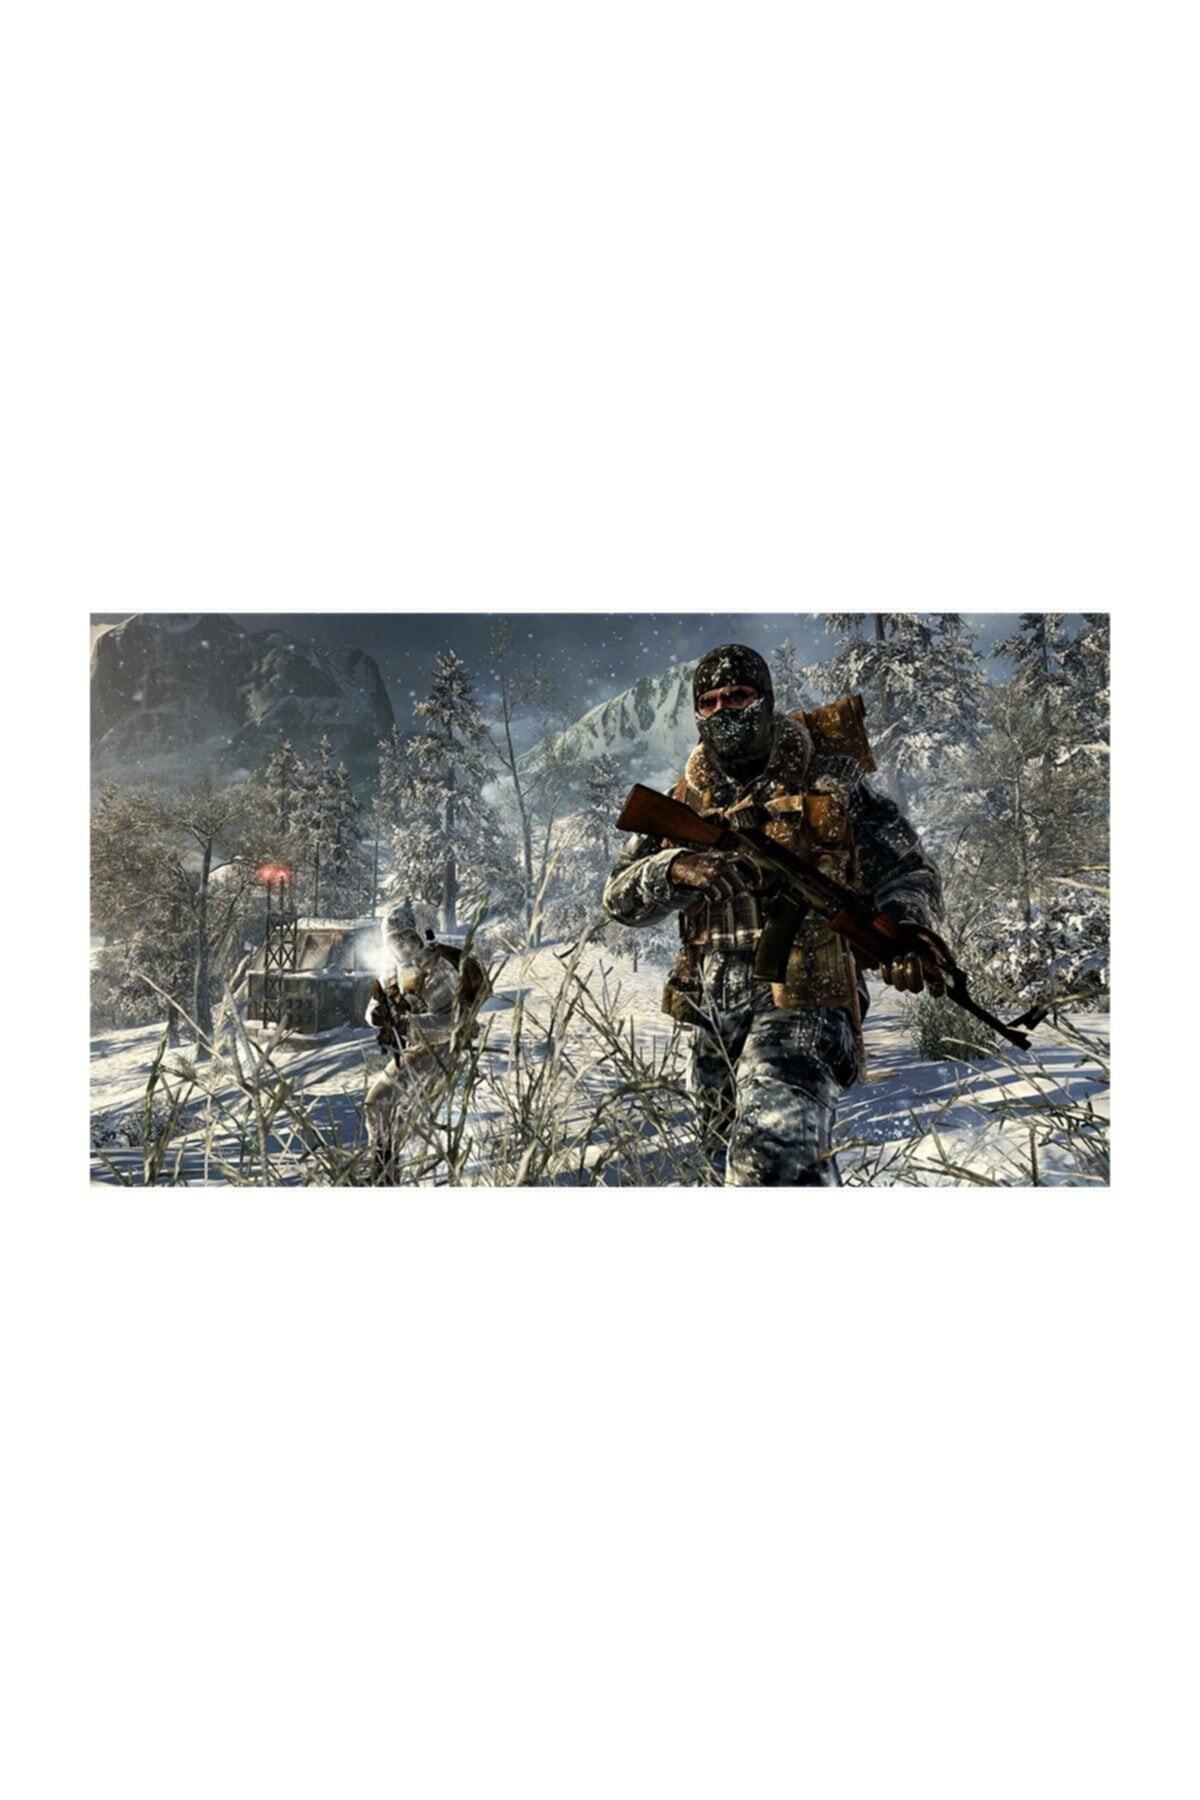 ACTIVISION Playstation 3 Oyunu Almanca Menü ( Call Of Duty Black Ops Ps3 ) Oyun 2